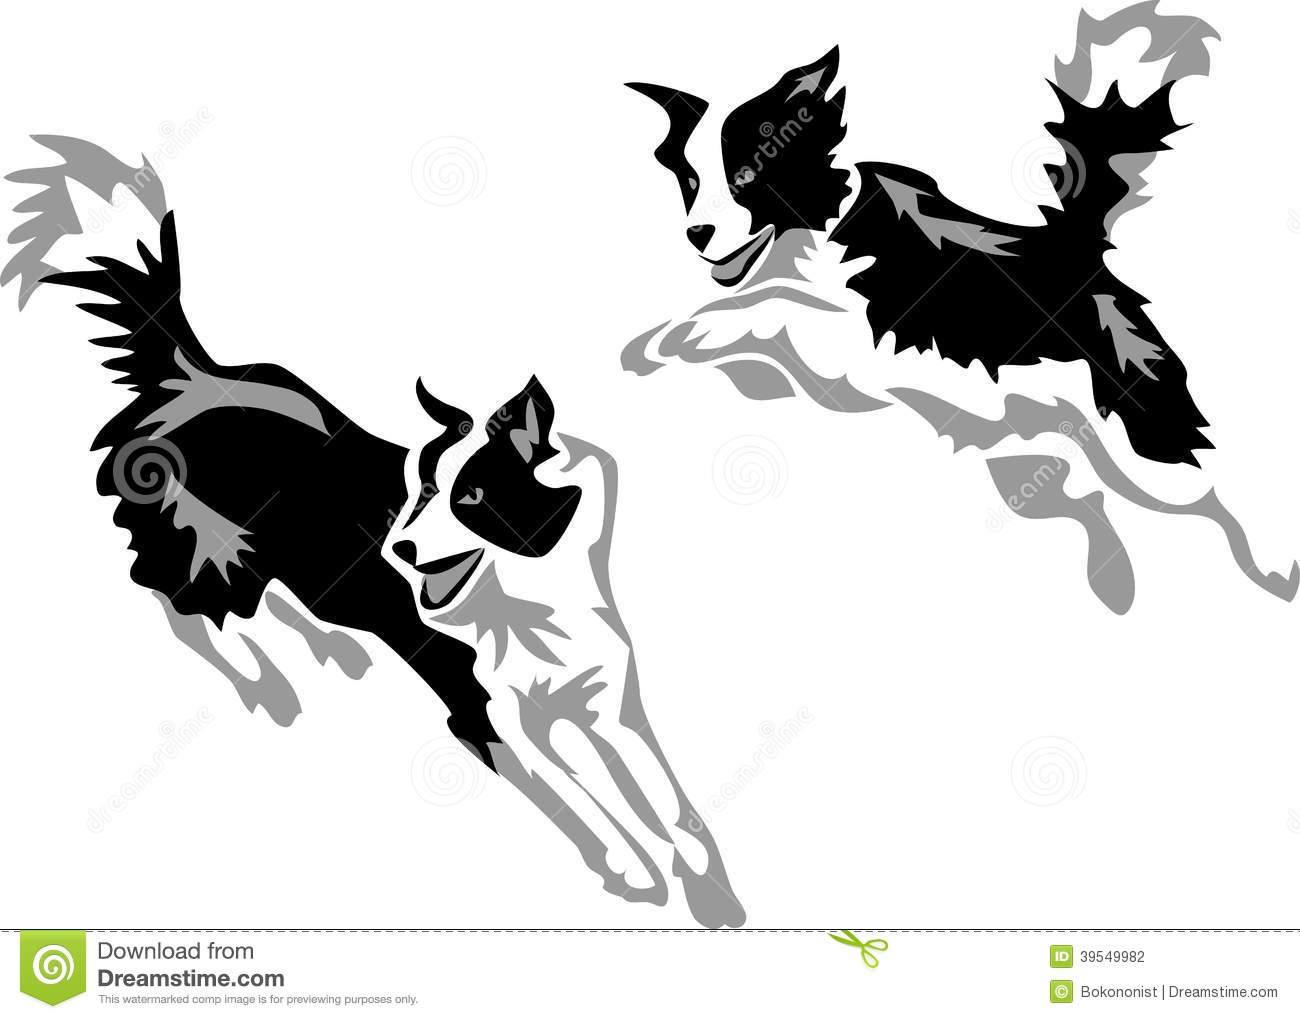 Border Collie dog - Illustration u0026mi-Border Collie dog - Illustration u0026middot; Agility Stock Photography-11